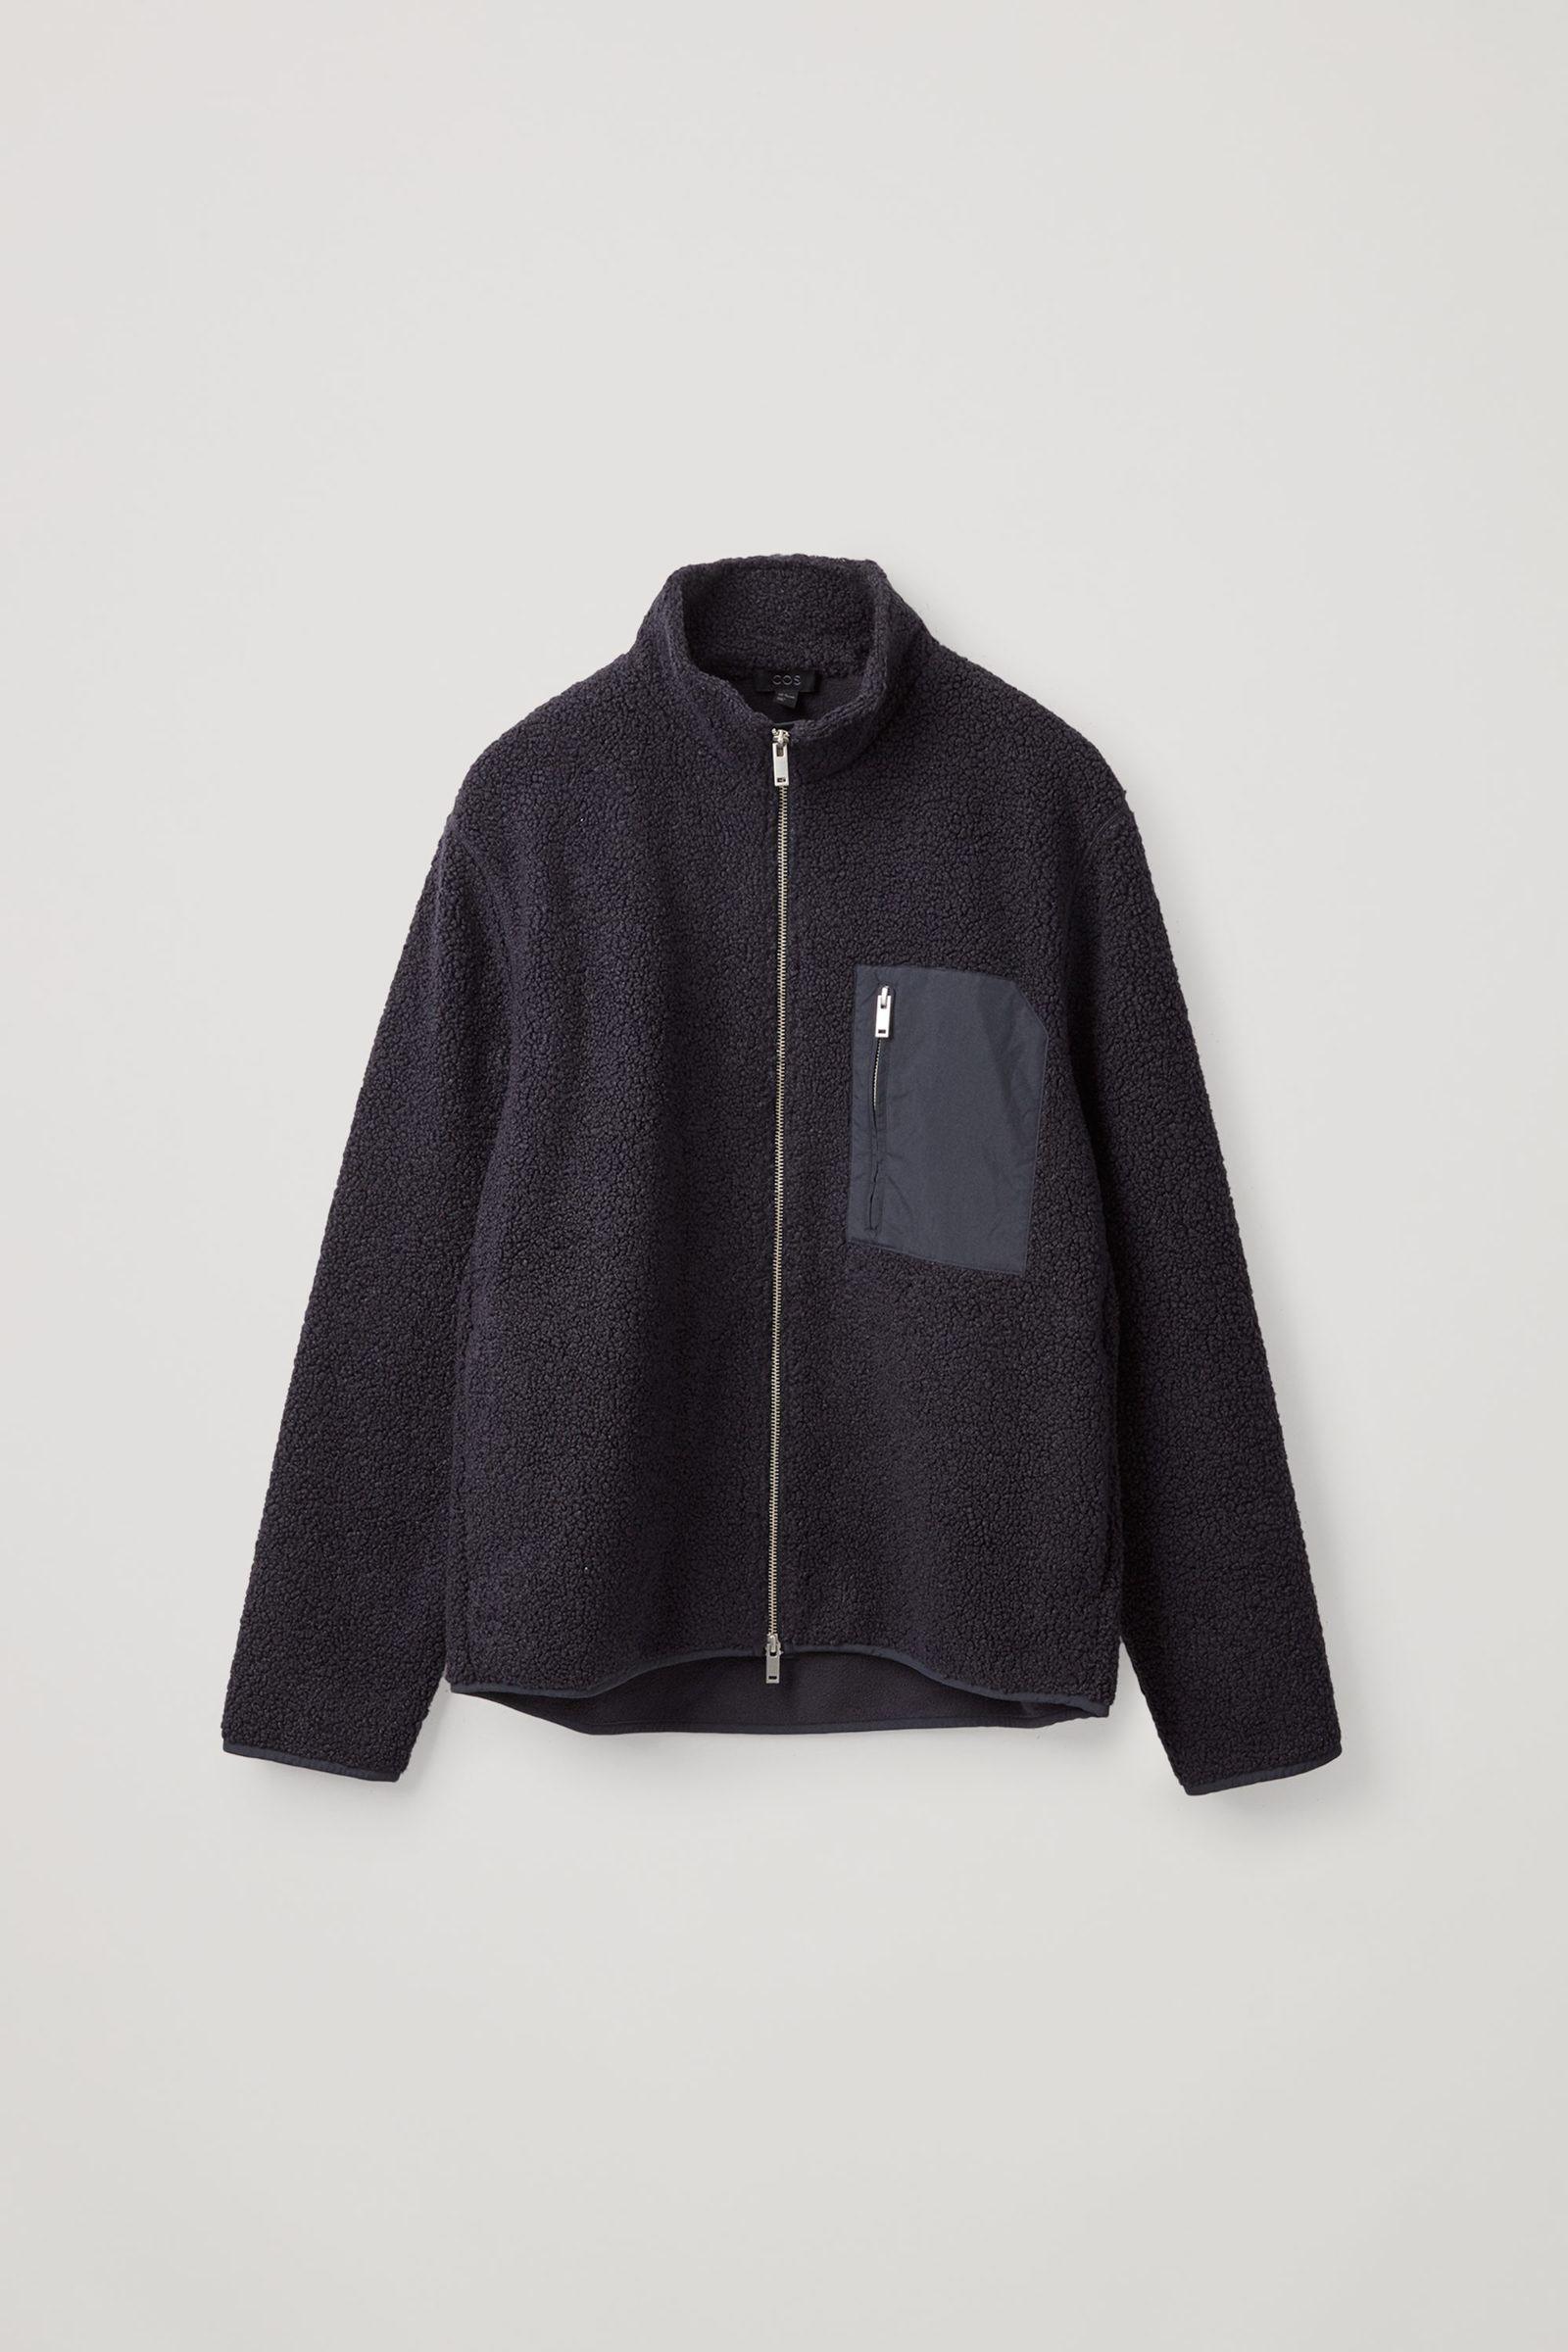 COS 테디 집업 재킷의 네이비컬러 Product입니다.